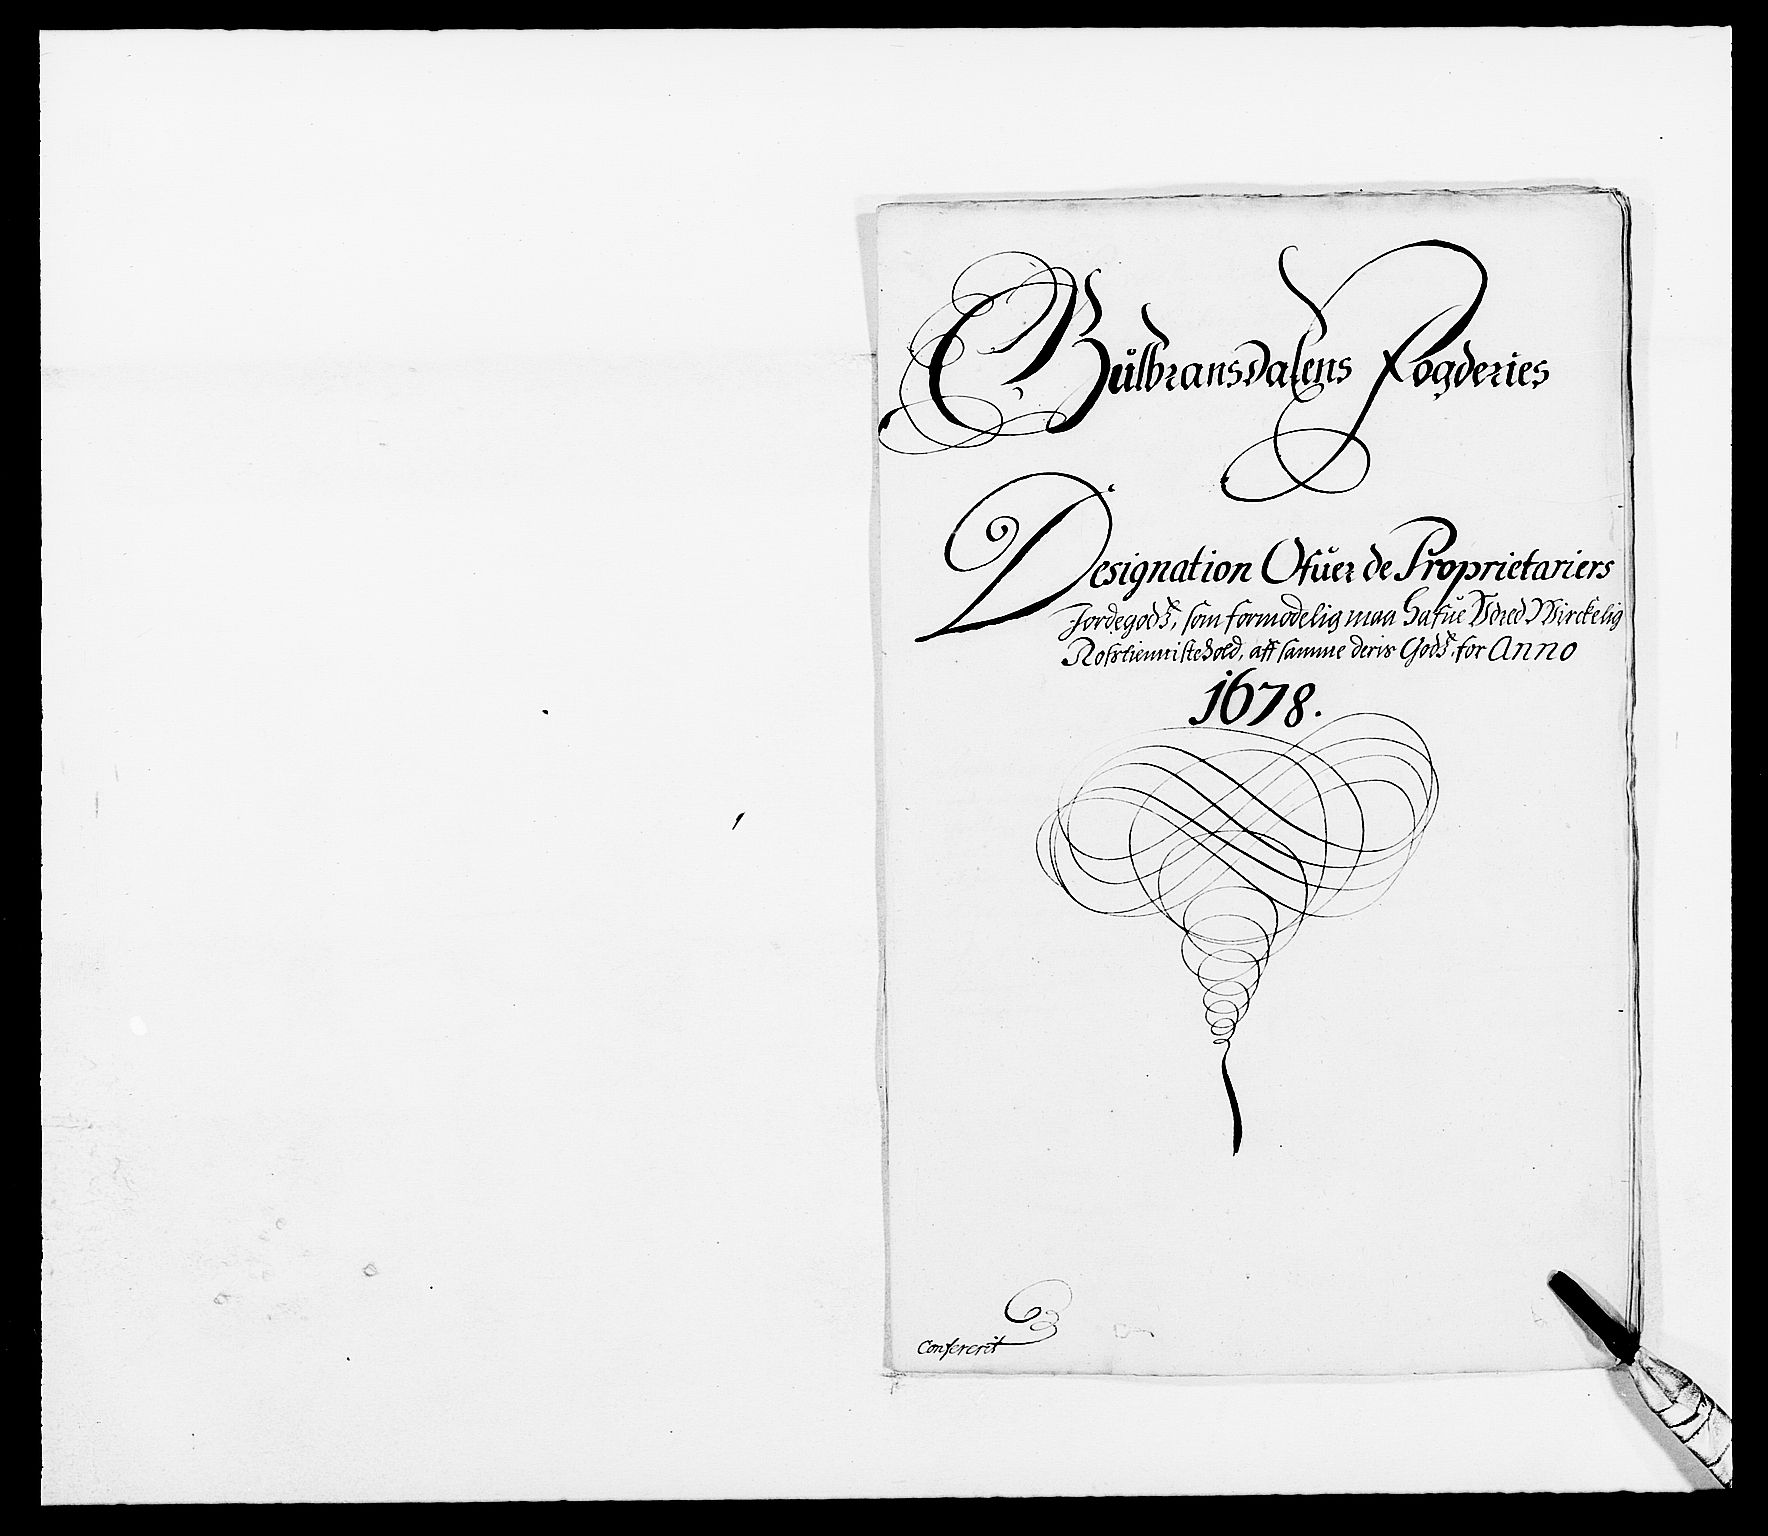 RA, Rentekammeret inntil 1814, Reviderte regnskaper, Fogderegnskap, R17/L1153: Fogderegnskap Gudbrandsdal, 1678-1679, s. 2